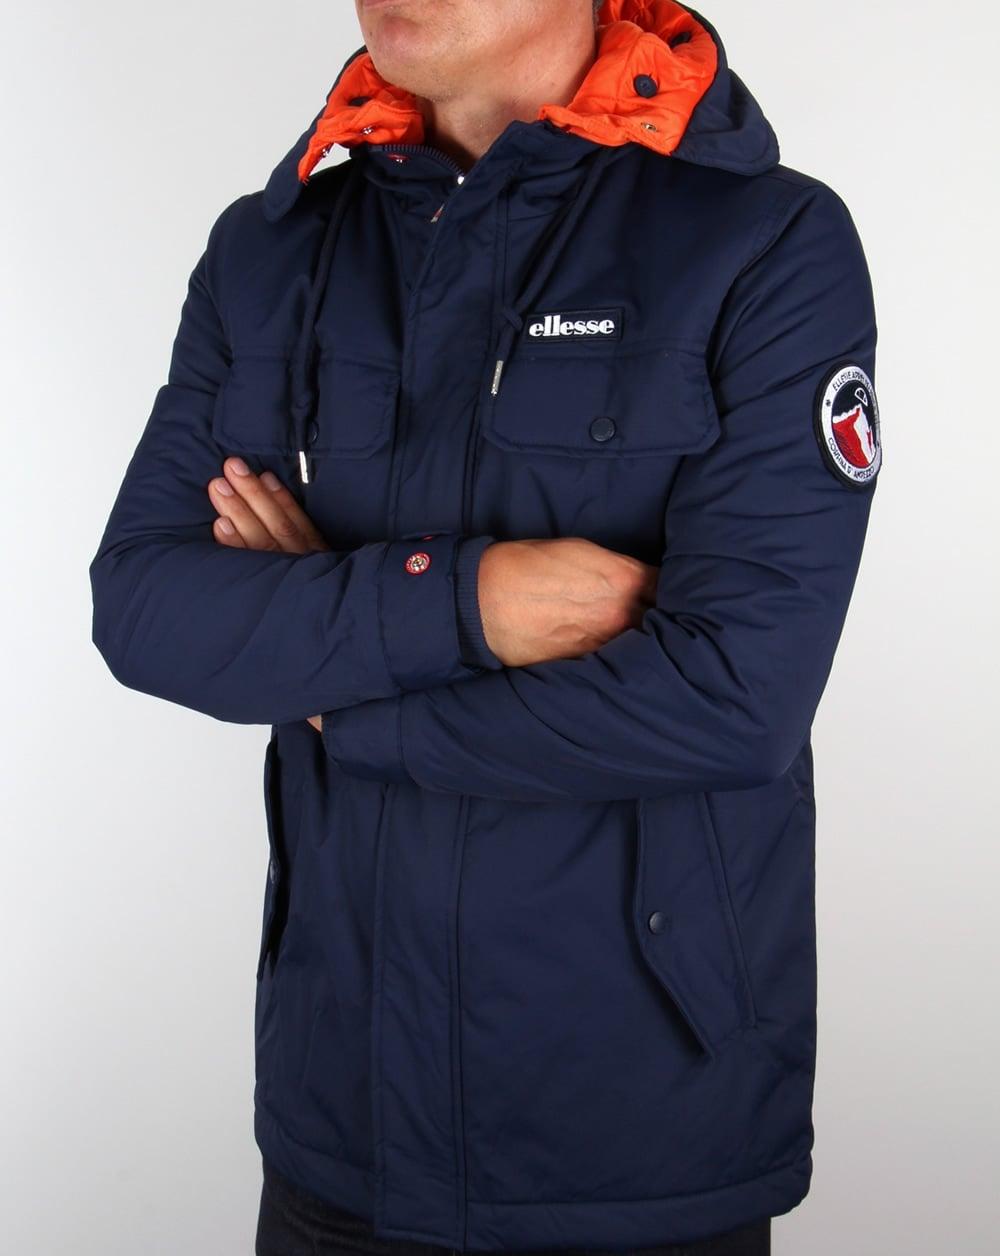 Ellesse Ski Jacket Navy, Dolomites, Parka, Hooded, padded ...